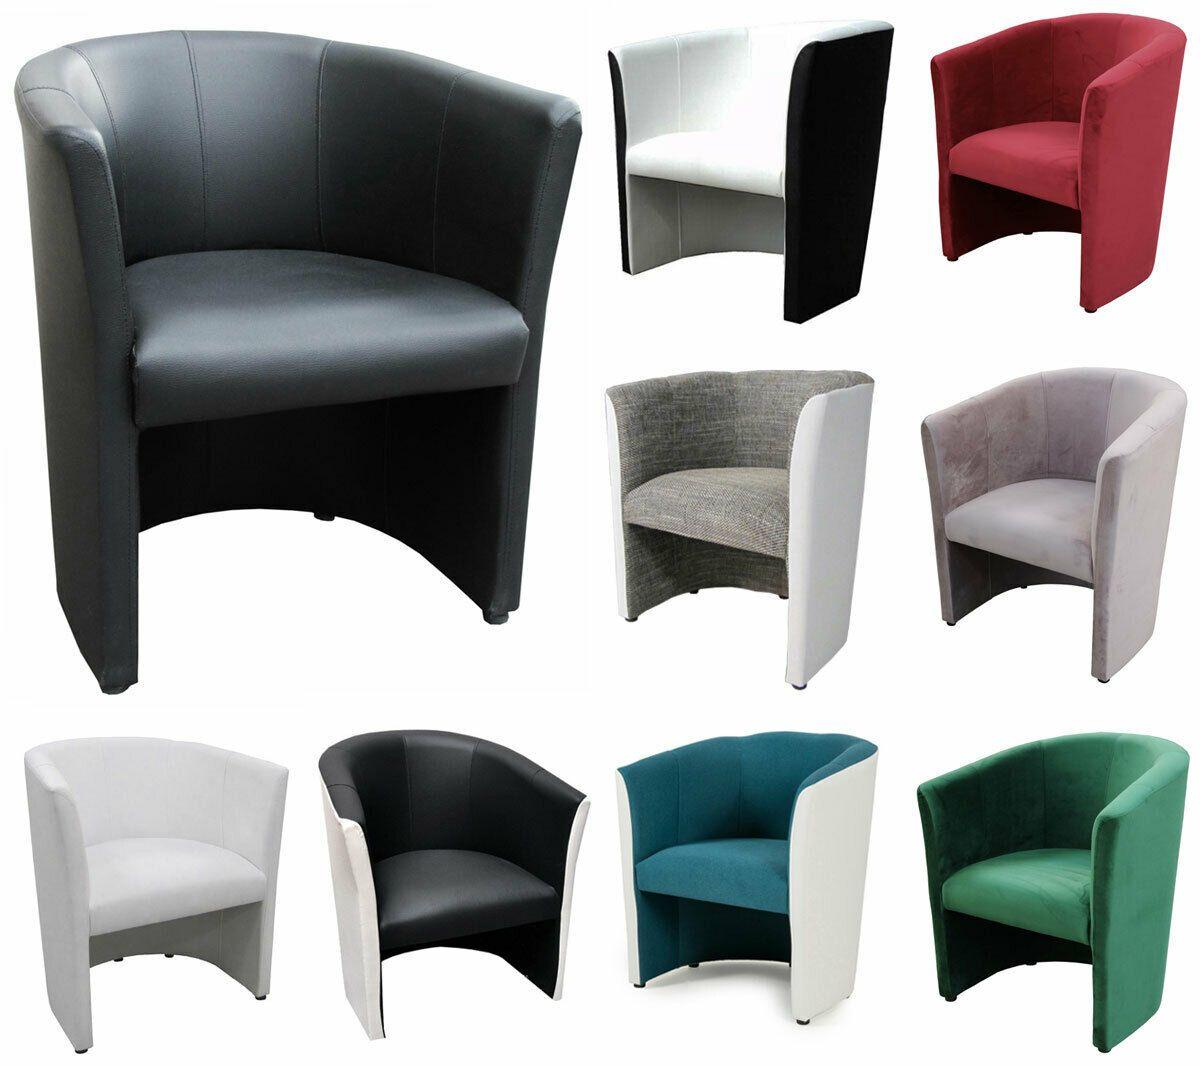 Cocktailsessel Club Clubsessel Sessel In Trendigen Farben Und Stoffen Ebay In 2020 Cocktailsessel Clubsessel Sessel